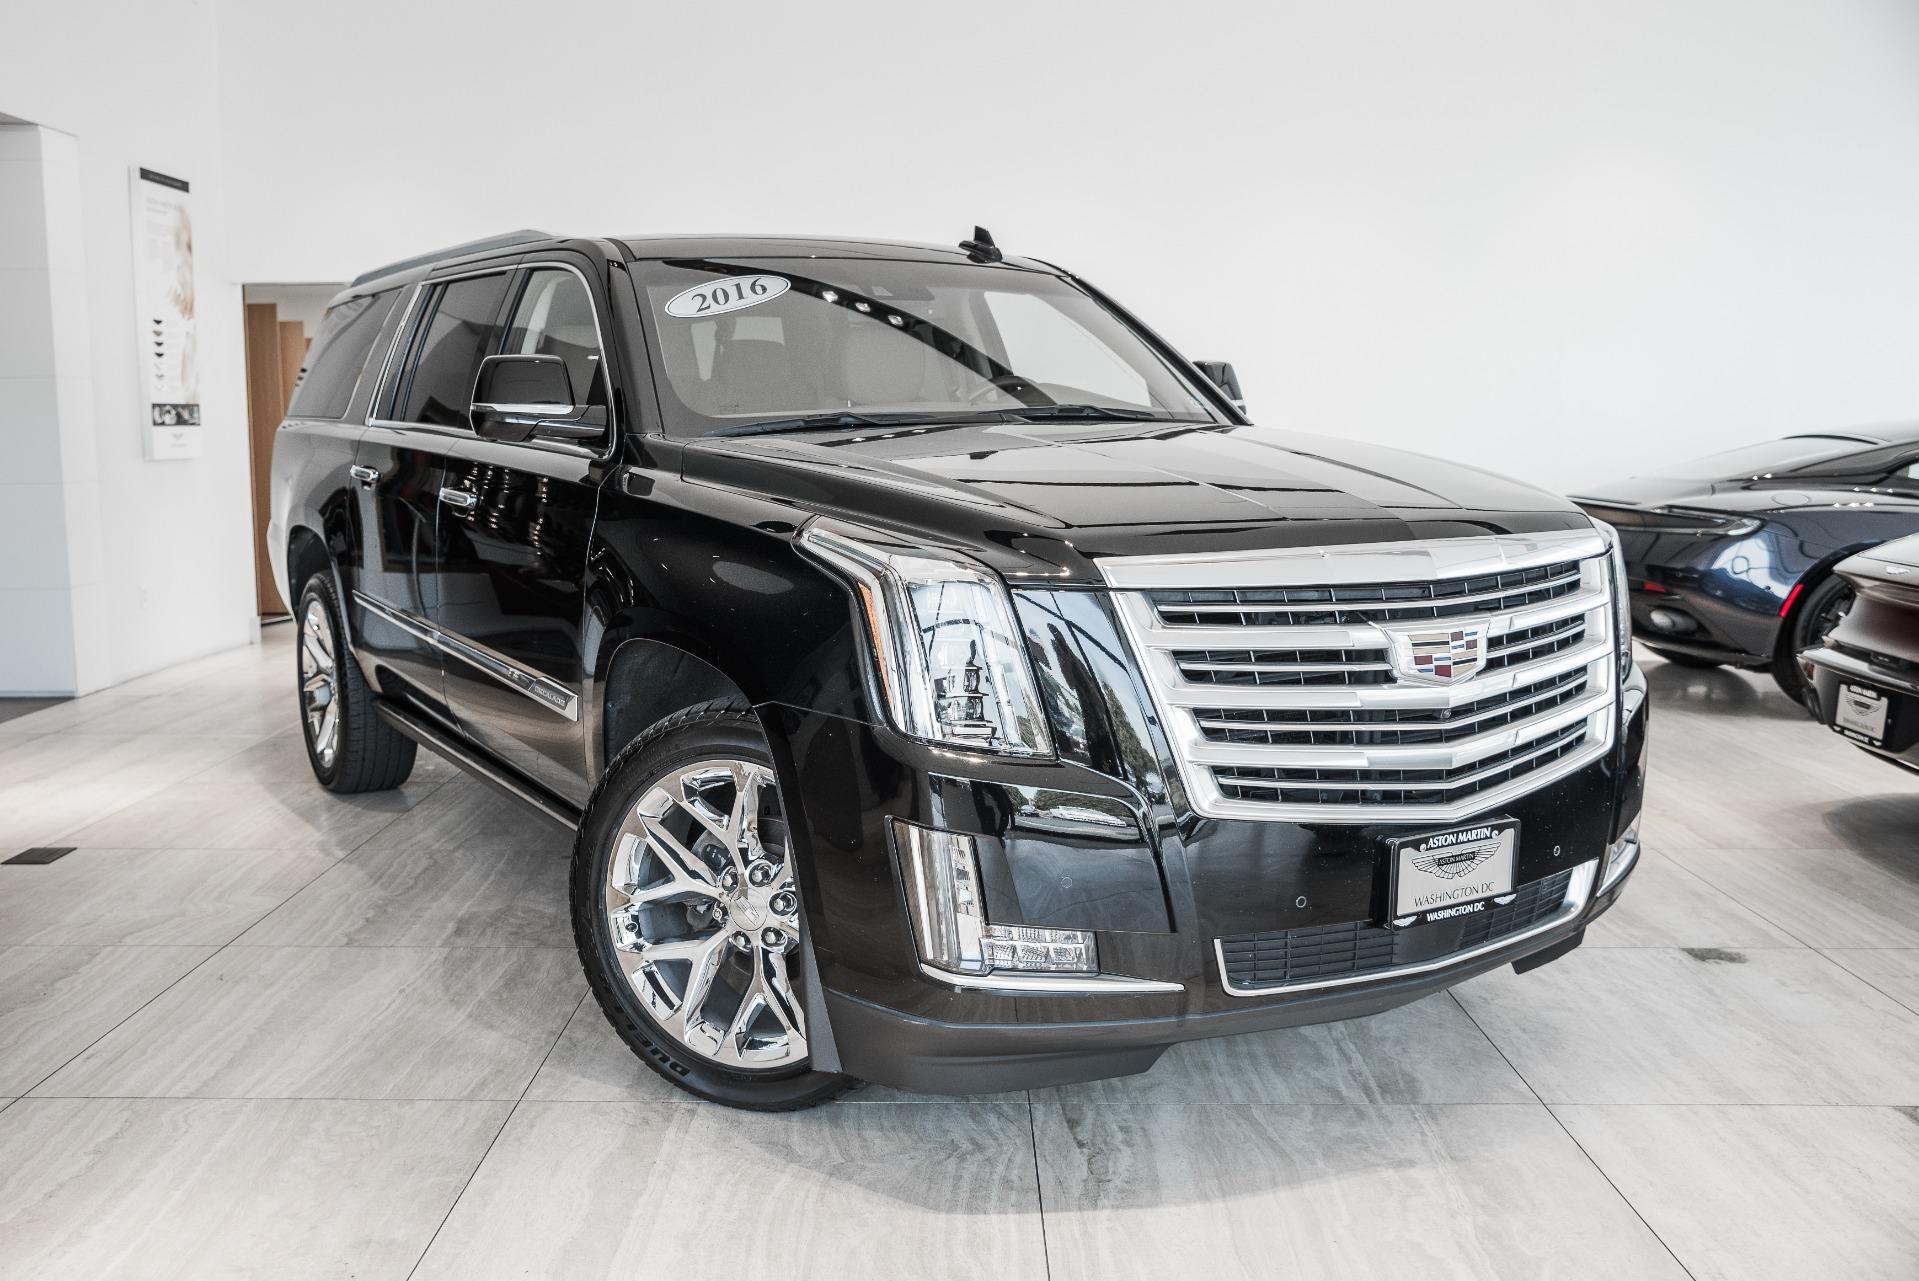 2016 Cadillac Escalade Esv Platinum Stock P016112b For Sale Near Vienna Va Va Cadillac Dealer